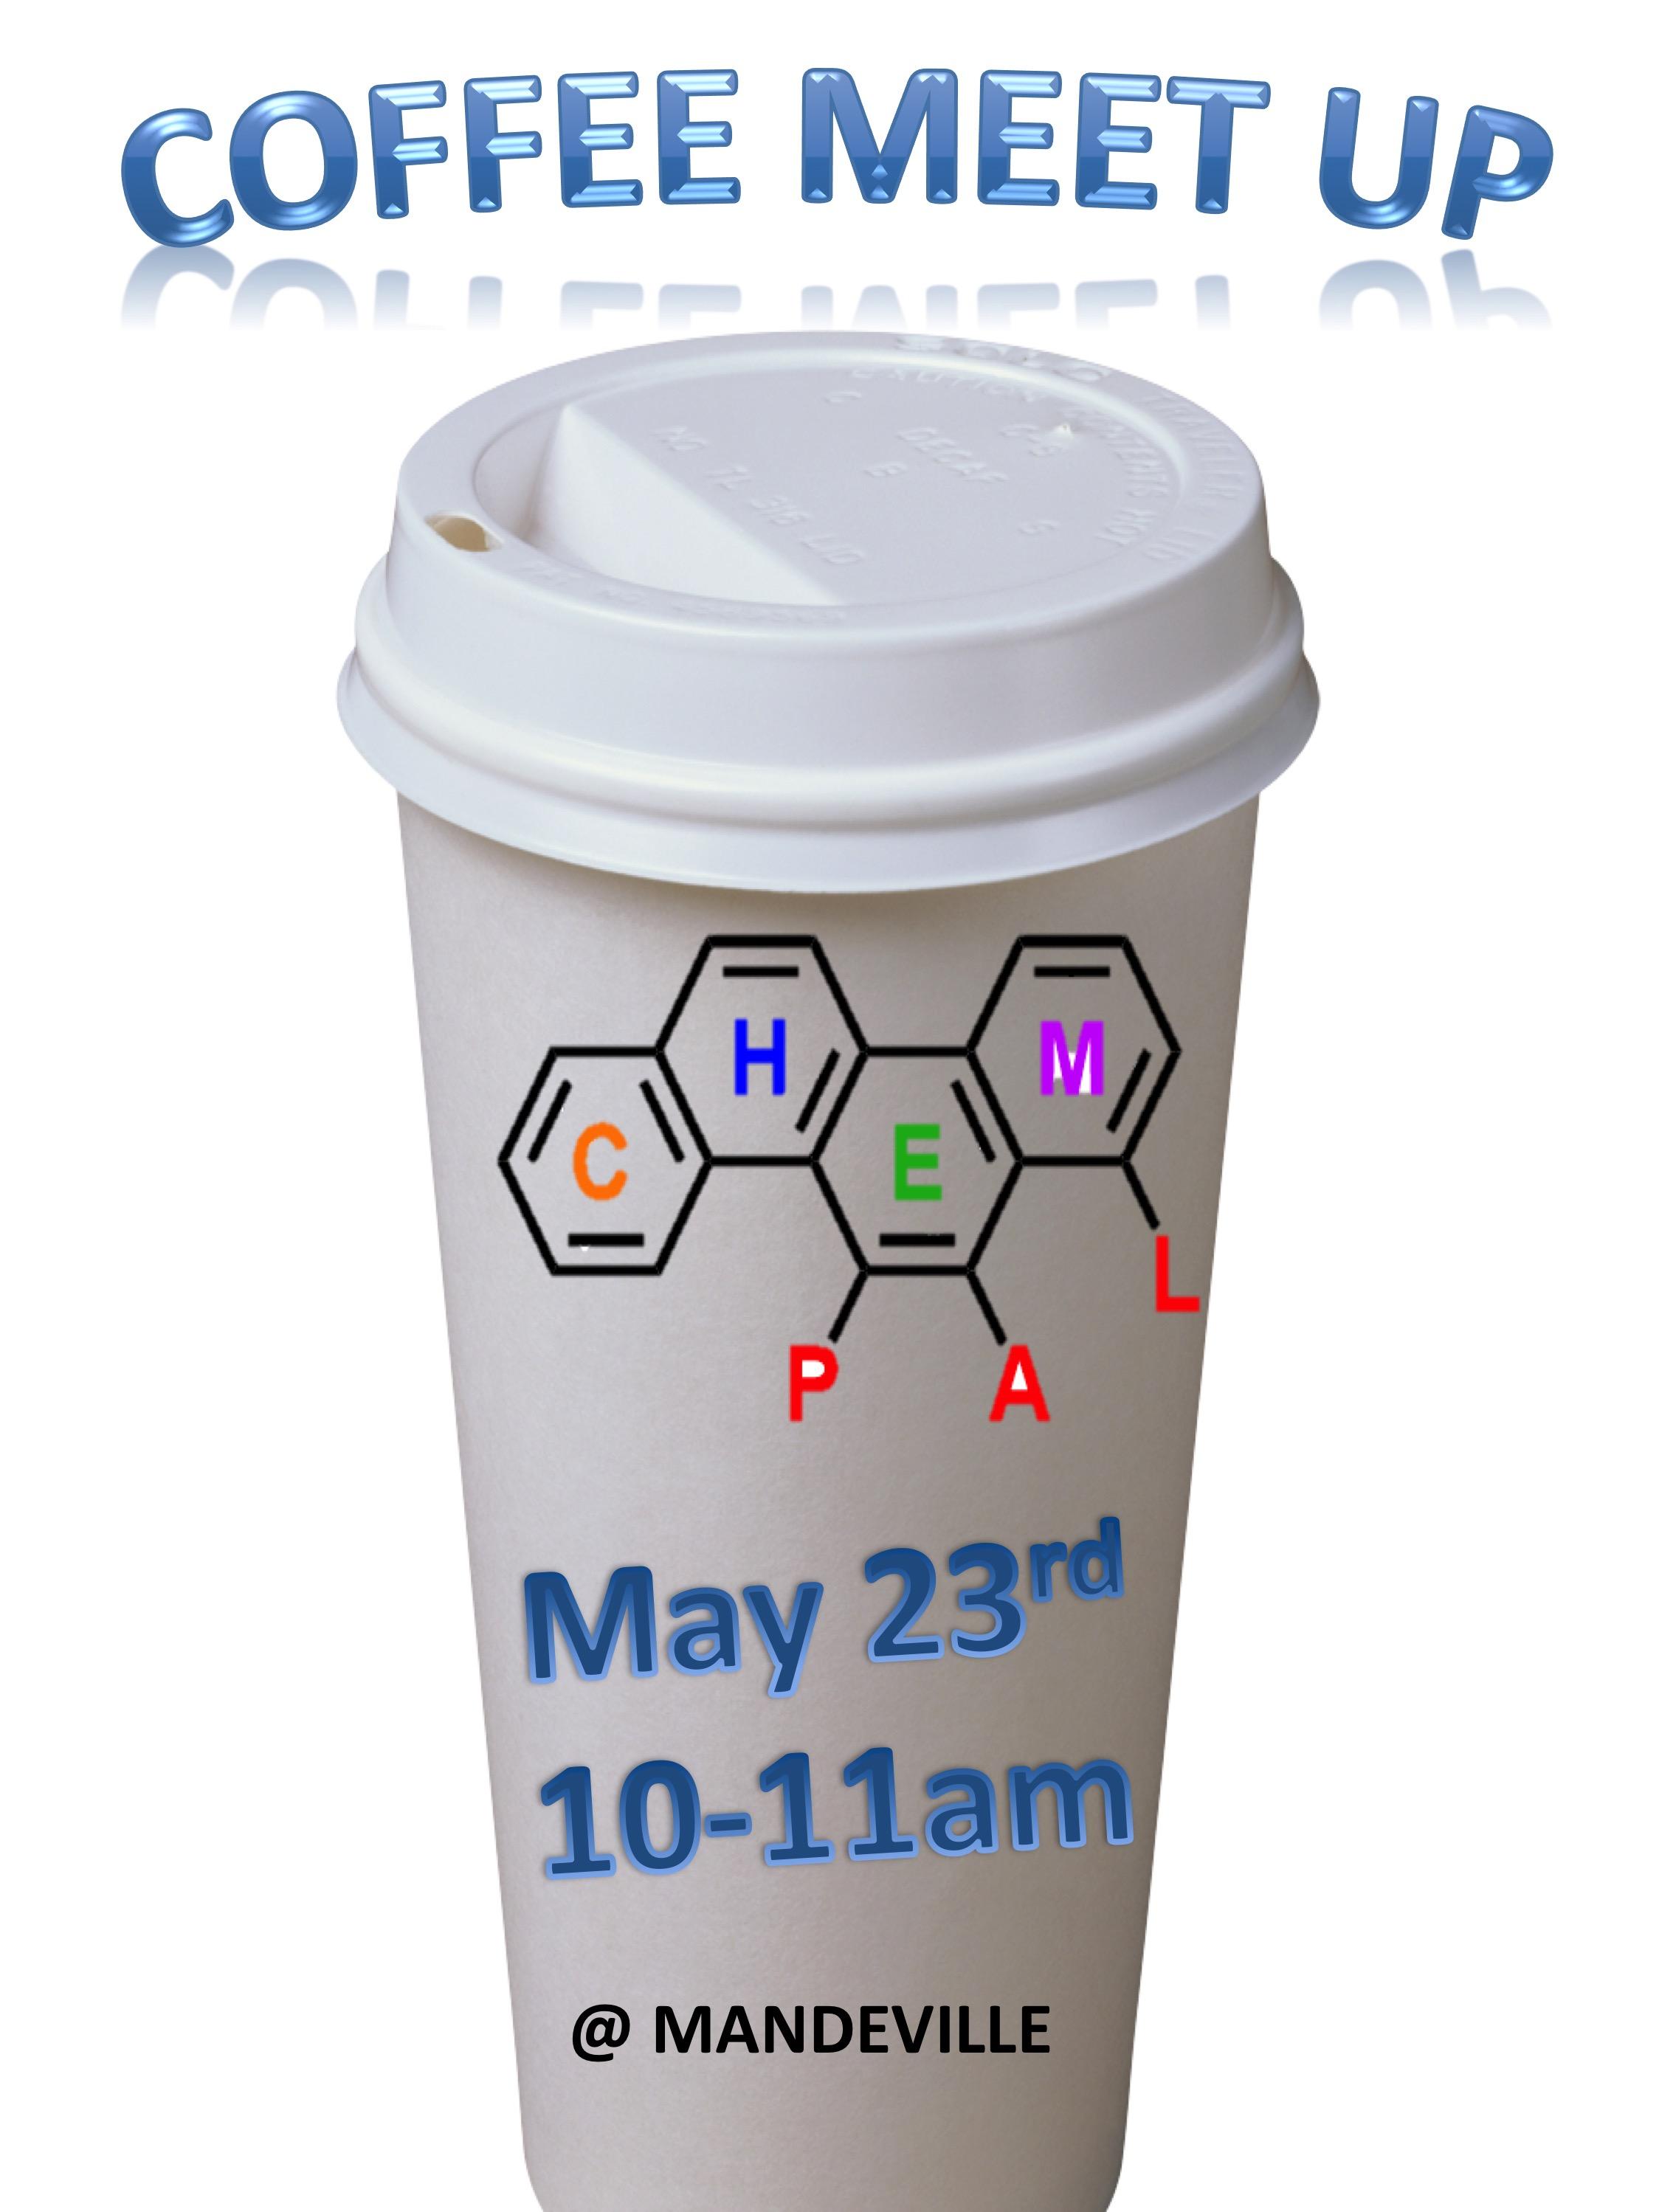 ChemPALcoffee.jpg